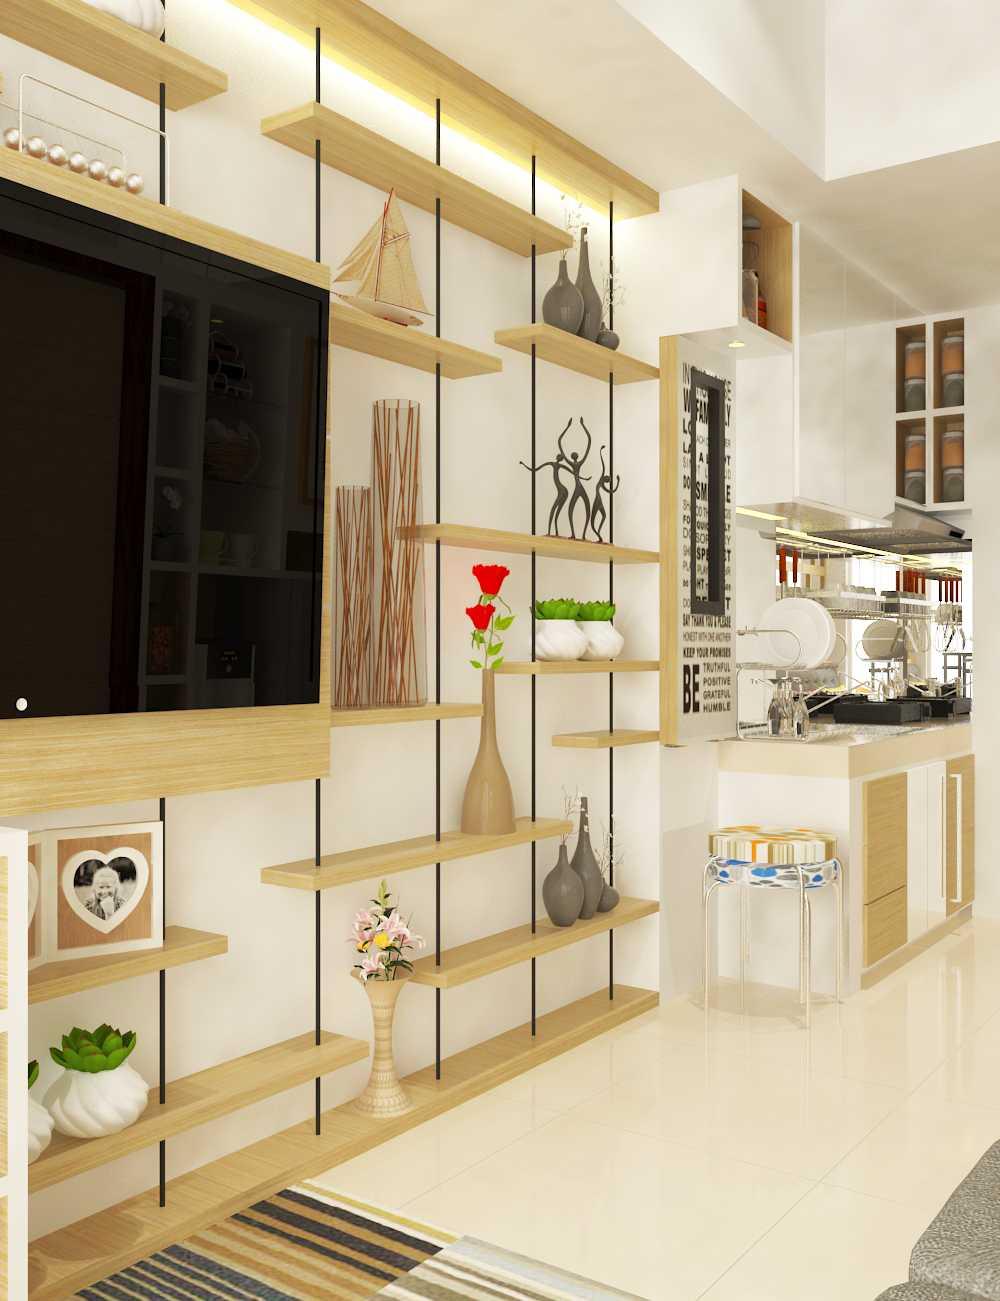 Miv Architects (Ar. Muhammad Ikhsan Hamiru, Iai & Partners) Interior Design Of Apartment Unit Makassar, South Sulawesi, Indonesia Makassar, South Sulawesi, Indonesia Apartment Room Design Kontemporer  29130